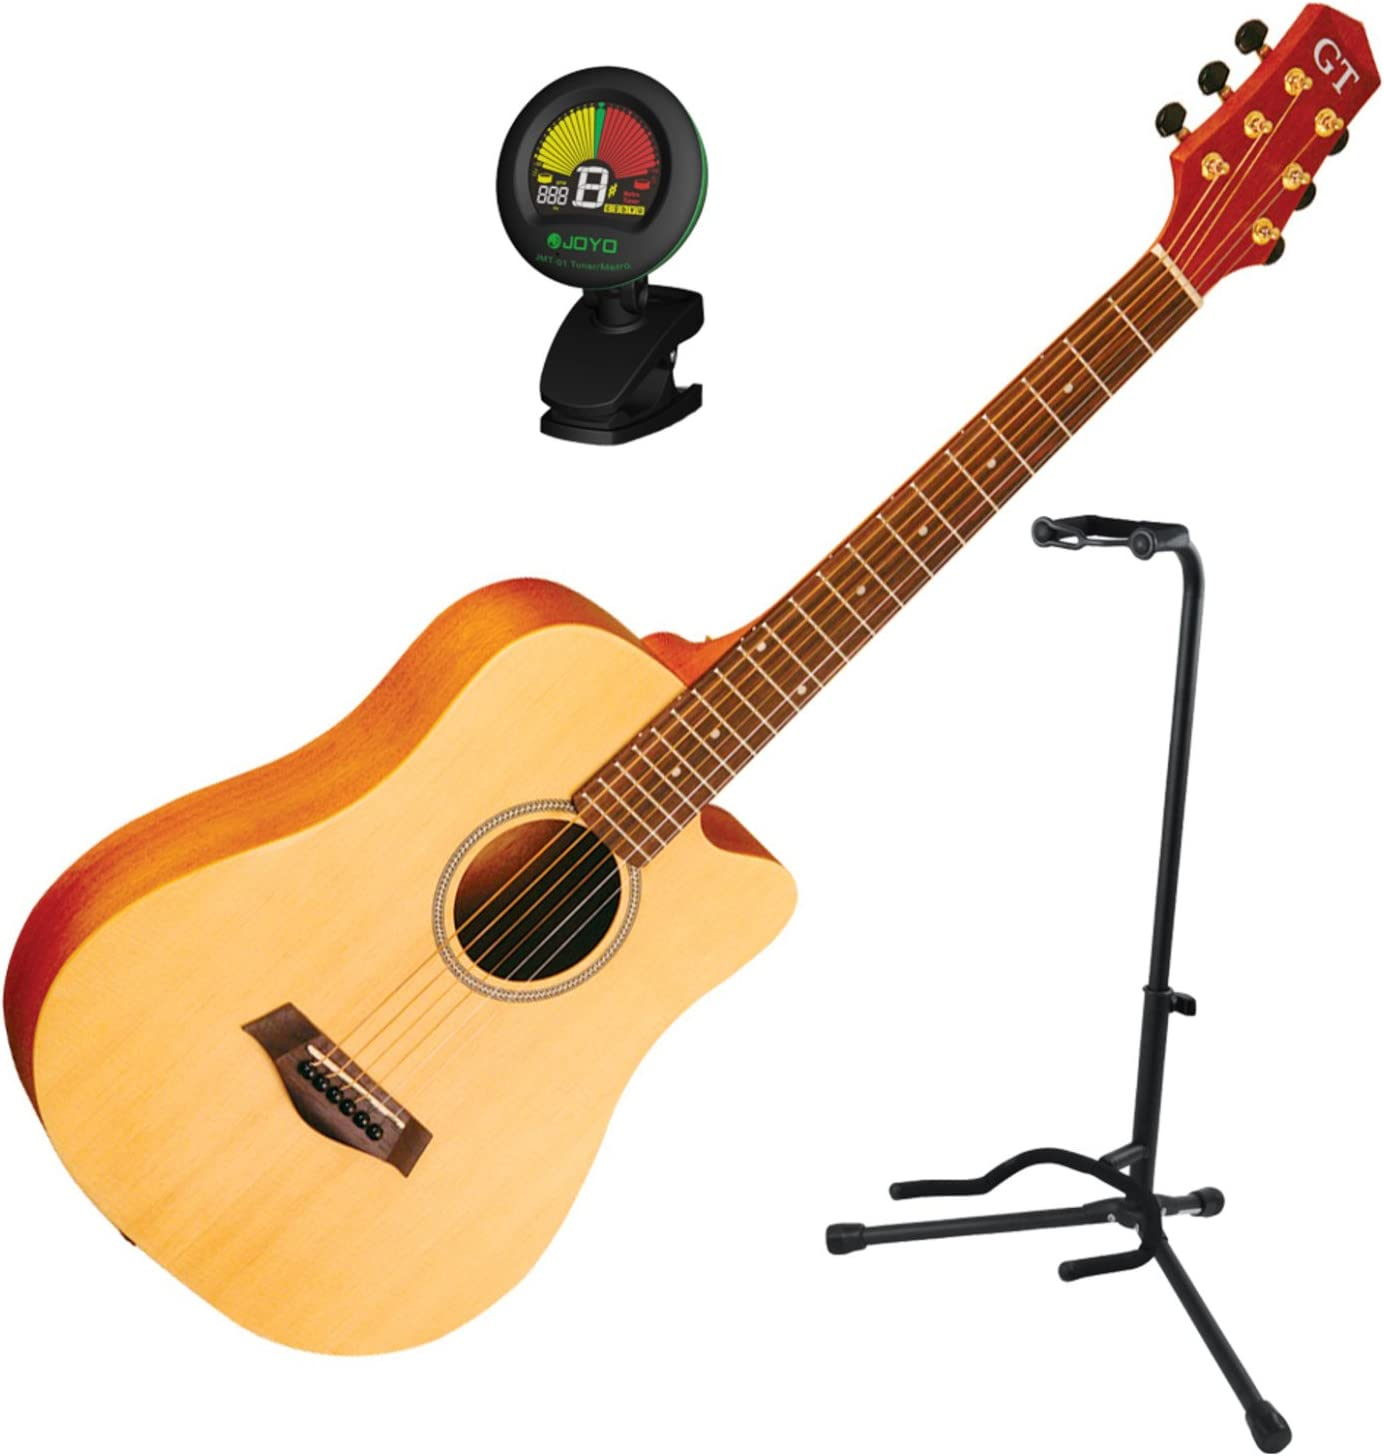 Goldtone M-Guitar Micro Cutaway Guitar w//Gig Bag and Stand Tuner